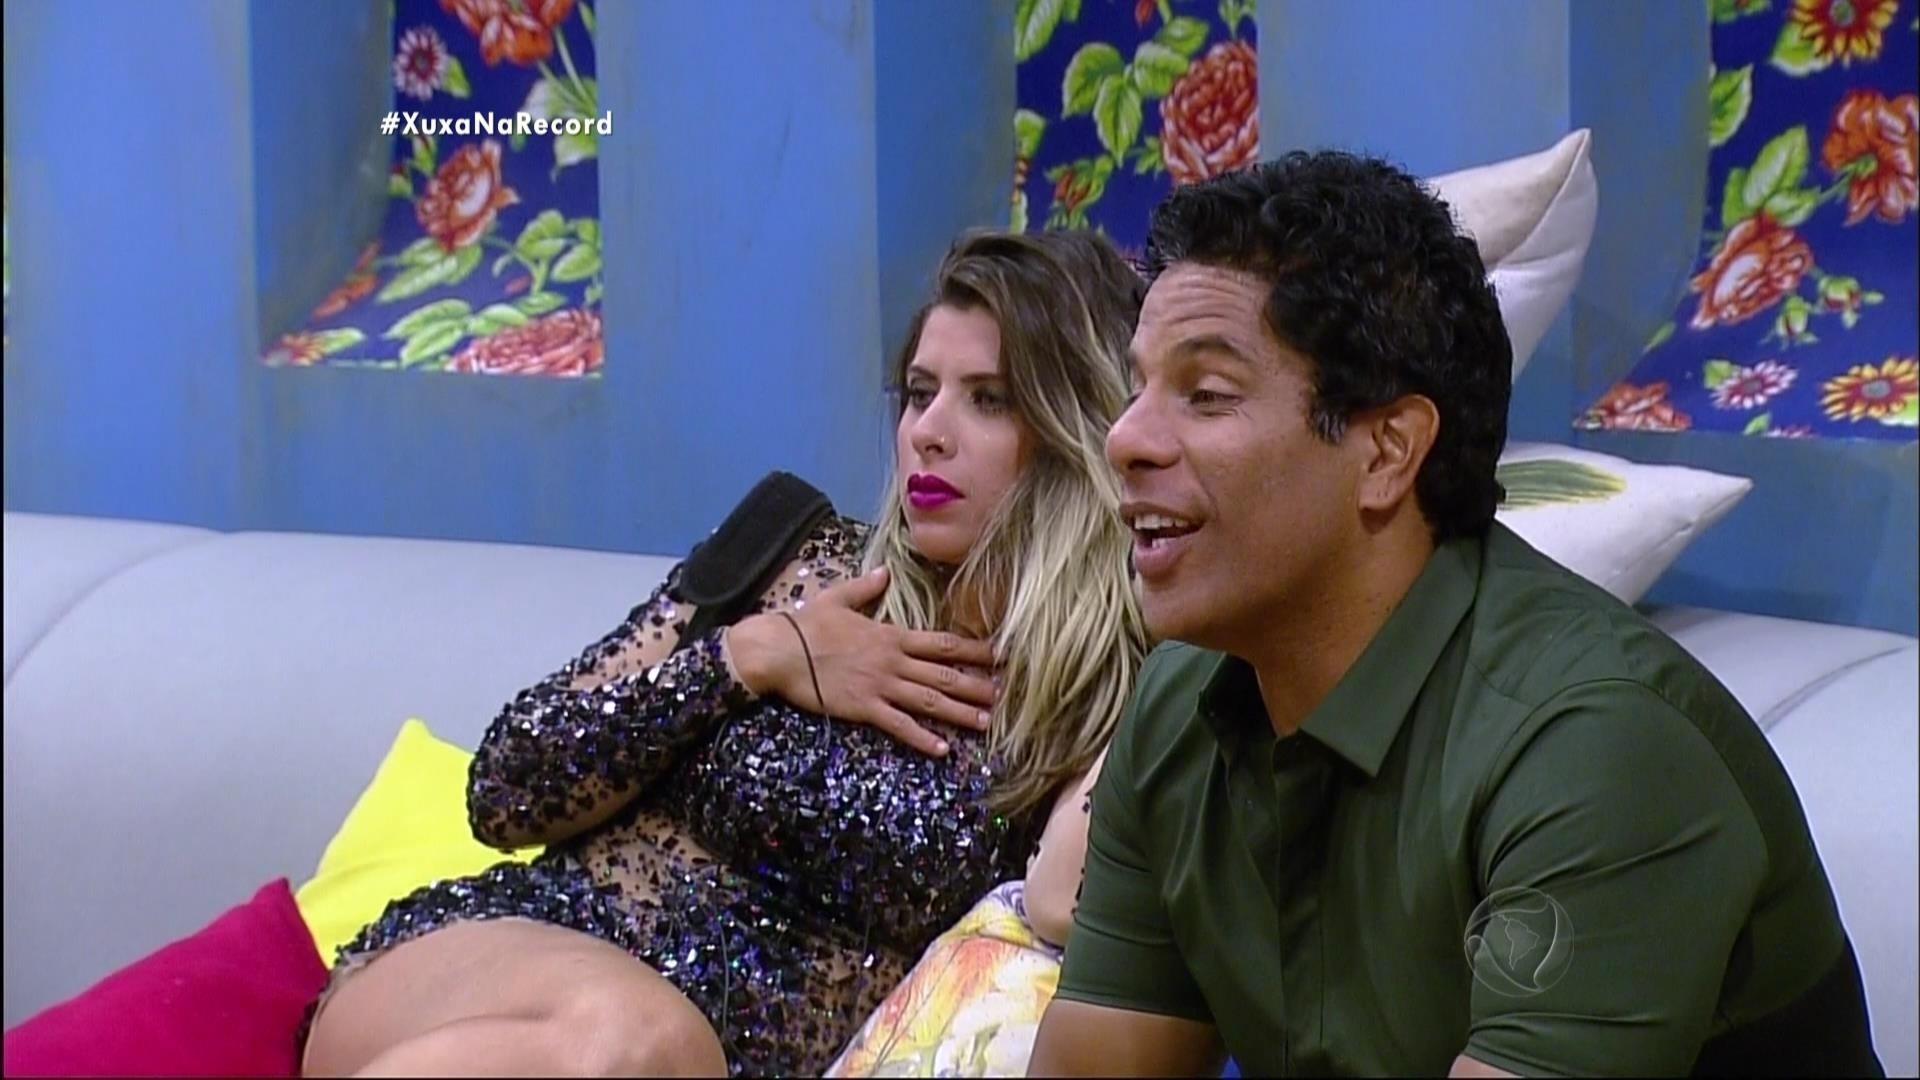 7.dez.2015 - Xuxa surpreendeu os finalistas Luka, Douglas e Ana Paula